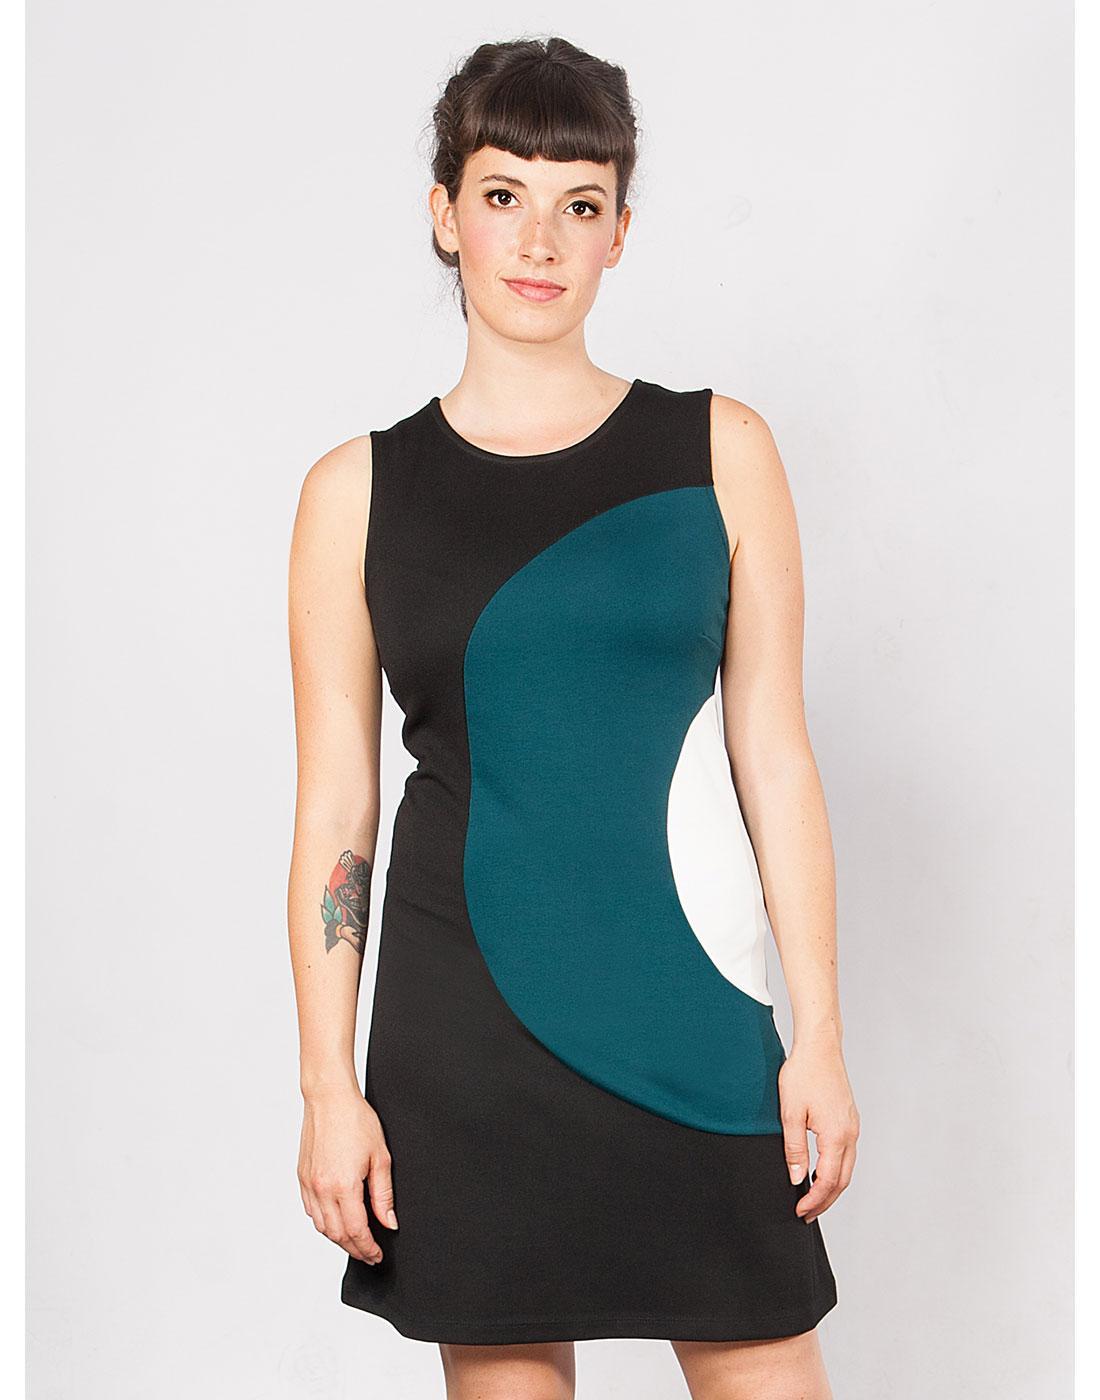 Peggy MADEMOISELLE YEYE Retro Mod Target Dress